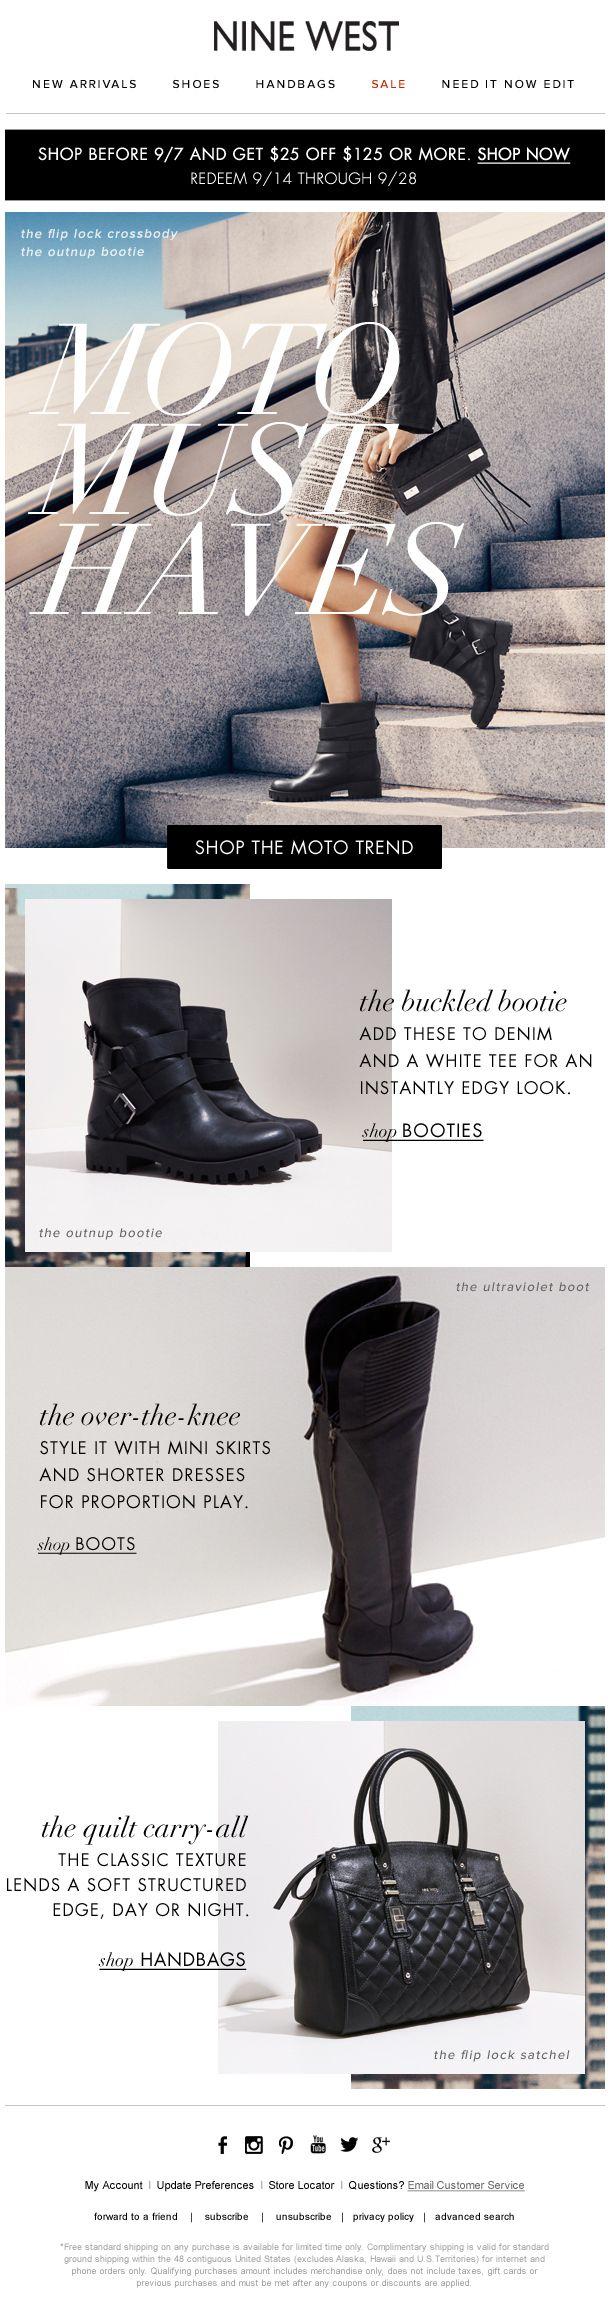 #ninewest #mosborne #email #layout #shoes #fall